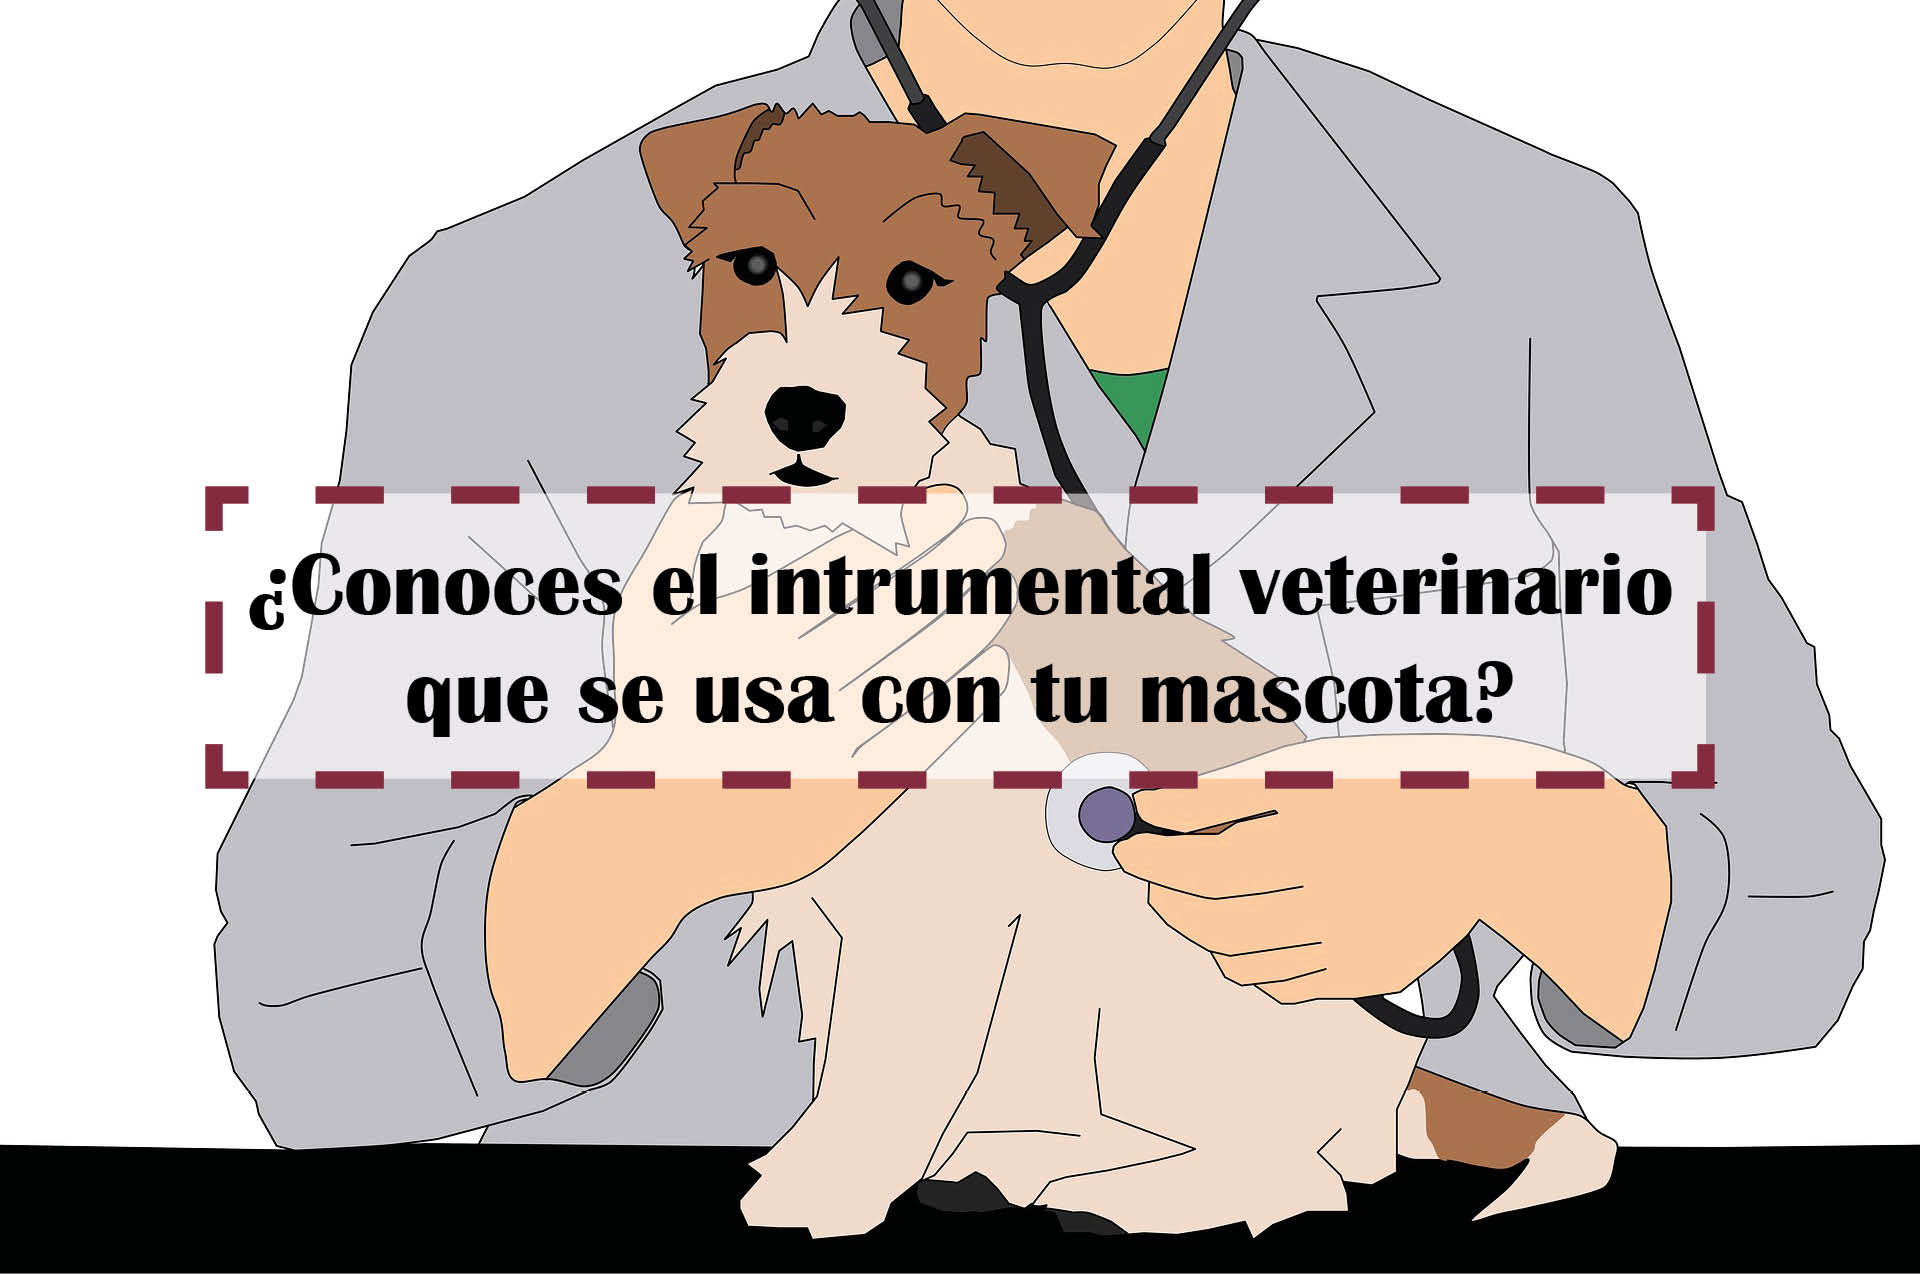 isntrumental veterinario